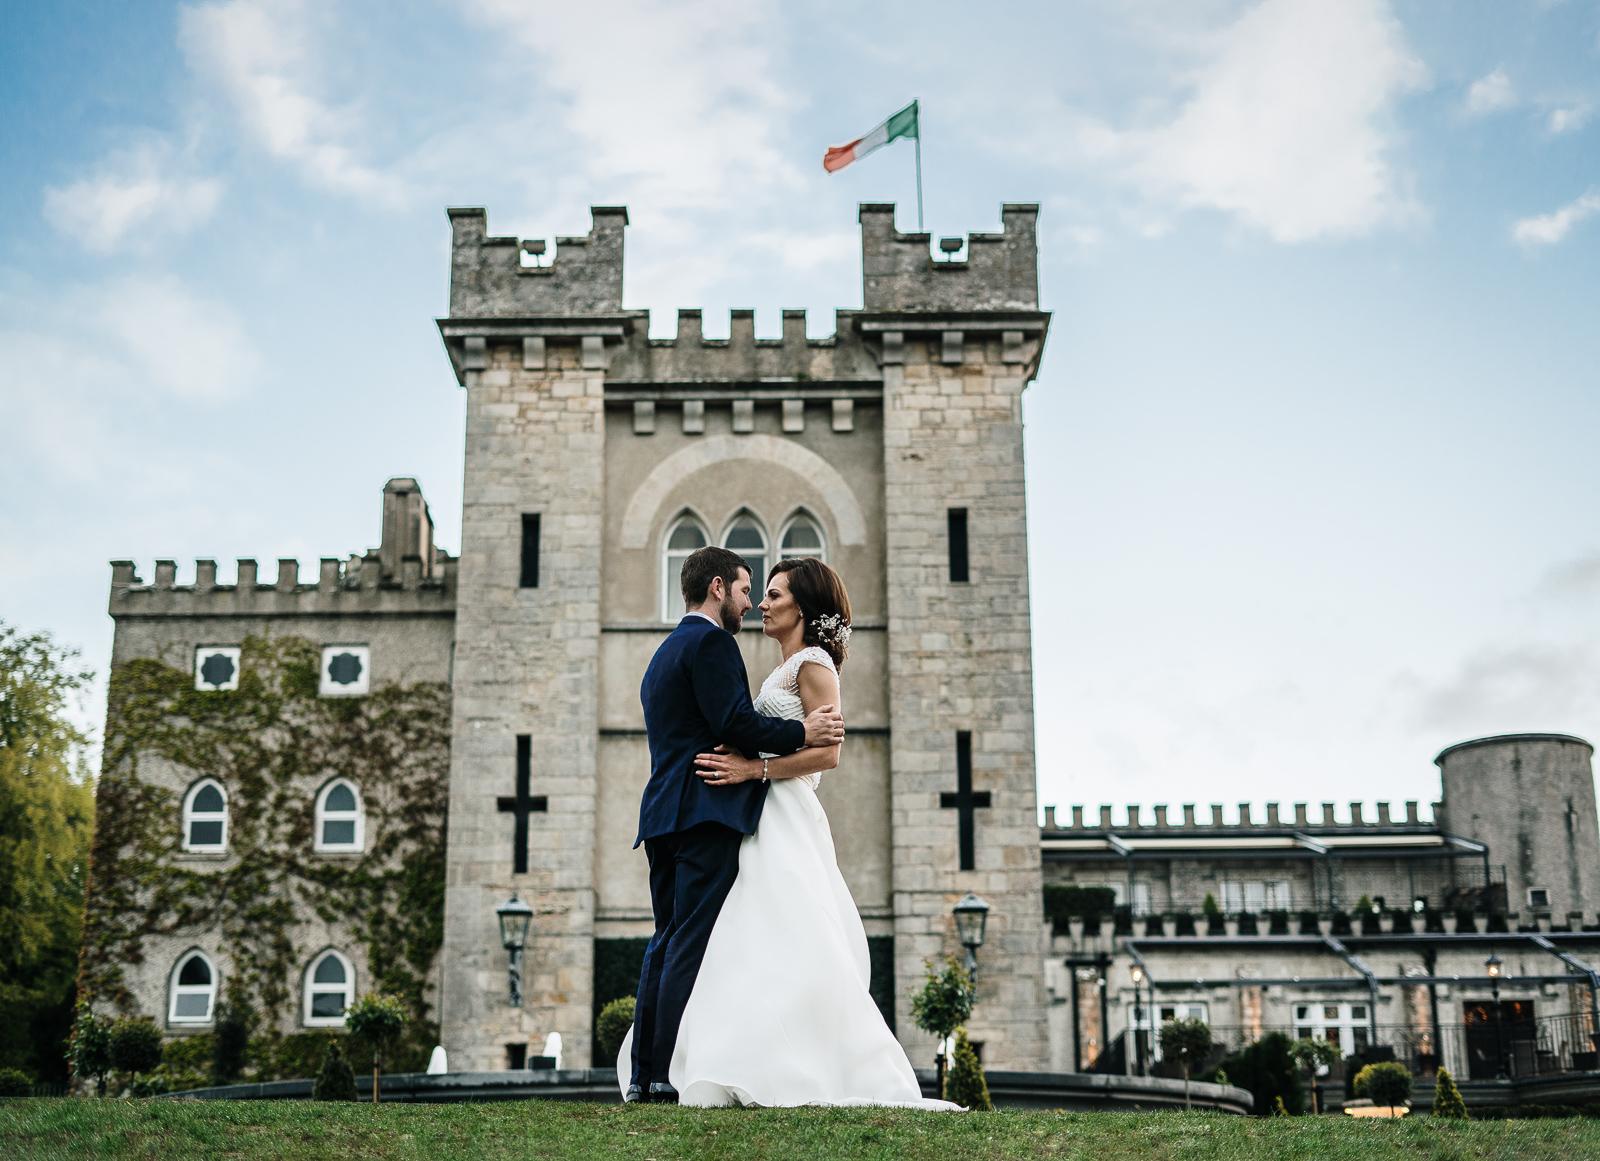 The luxury Cabra Castle wedding